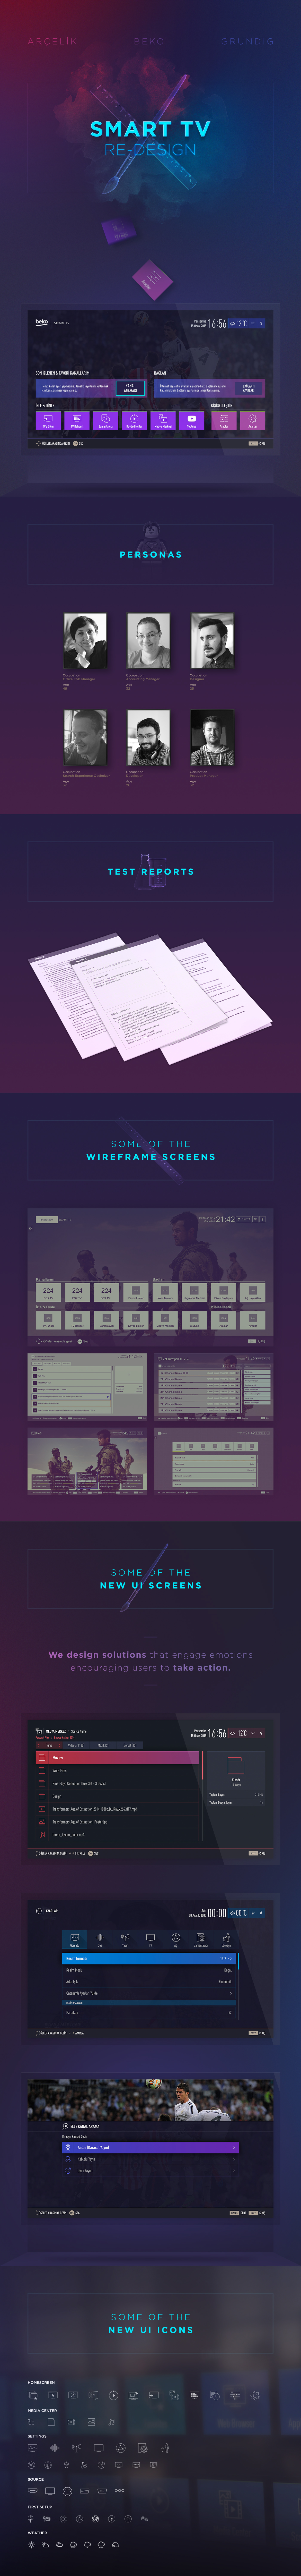 ux UI arçelik UX design ui design smart tv user interface beko Grundig